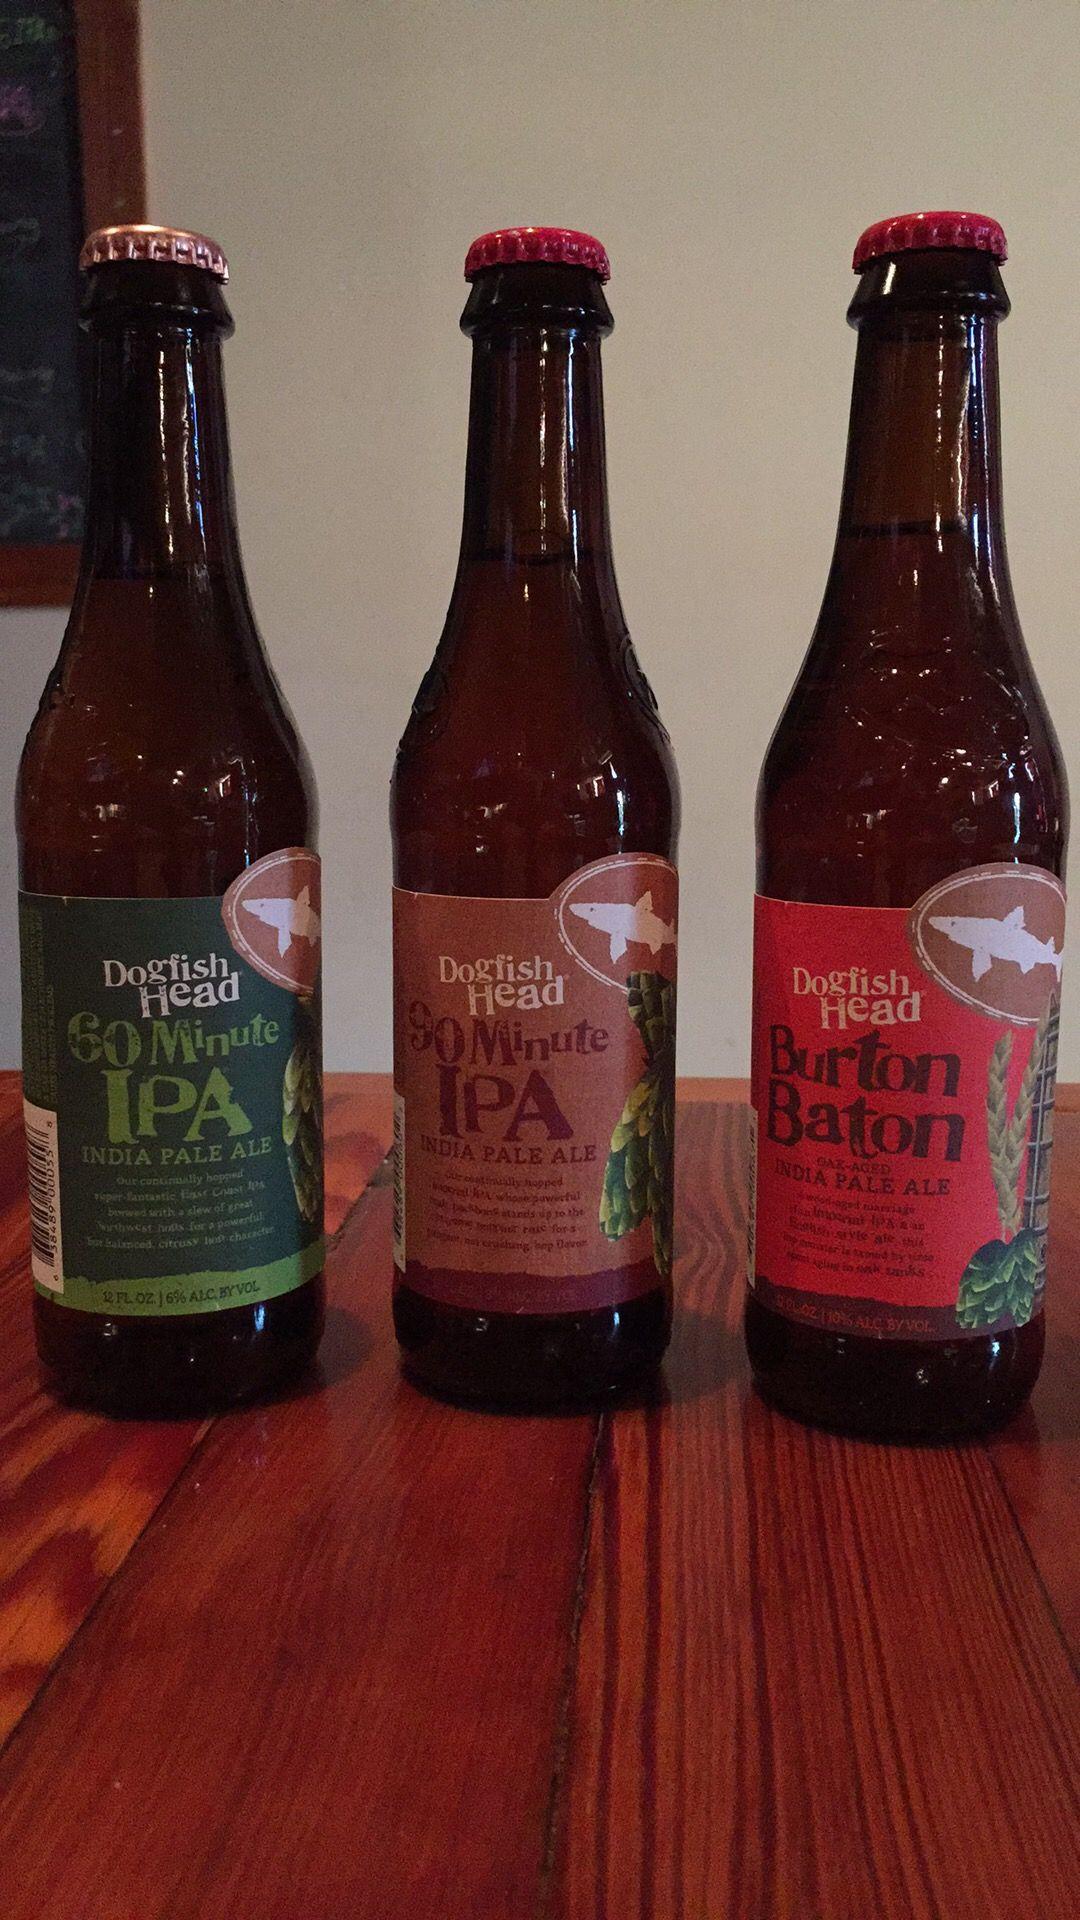 Dogfish Head 60 Minute Ipa 90 Minute Ipa And Burton Baton India Pale Ale Dogfish Head Craft Beer